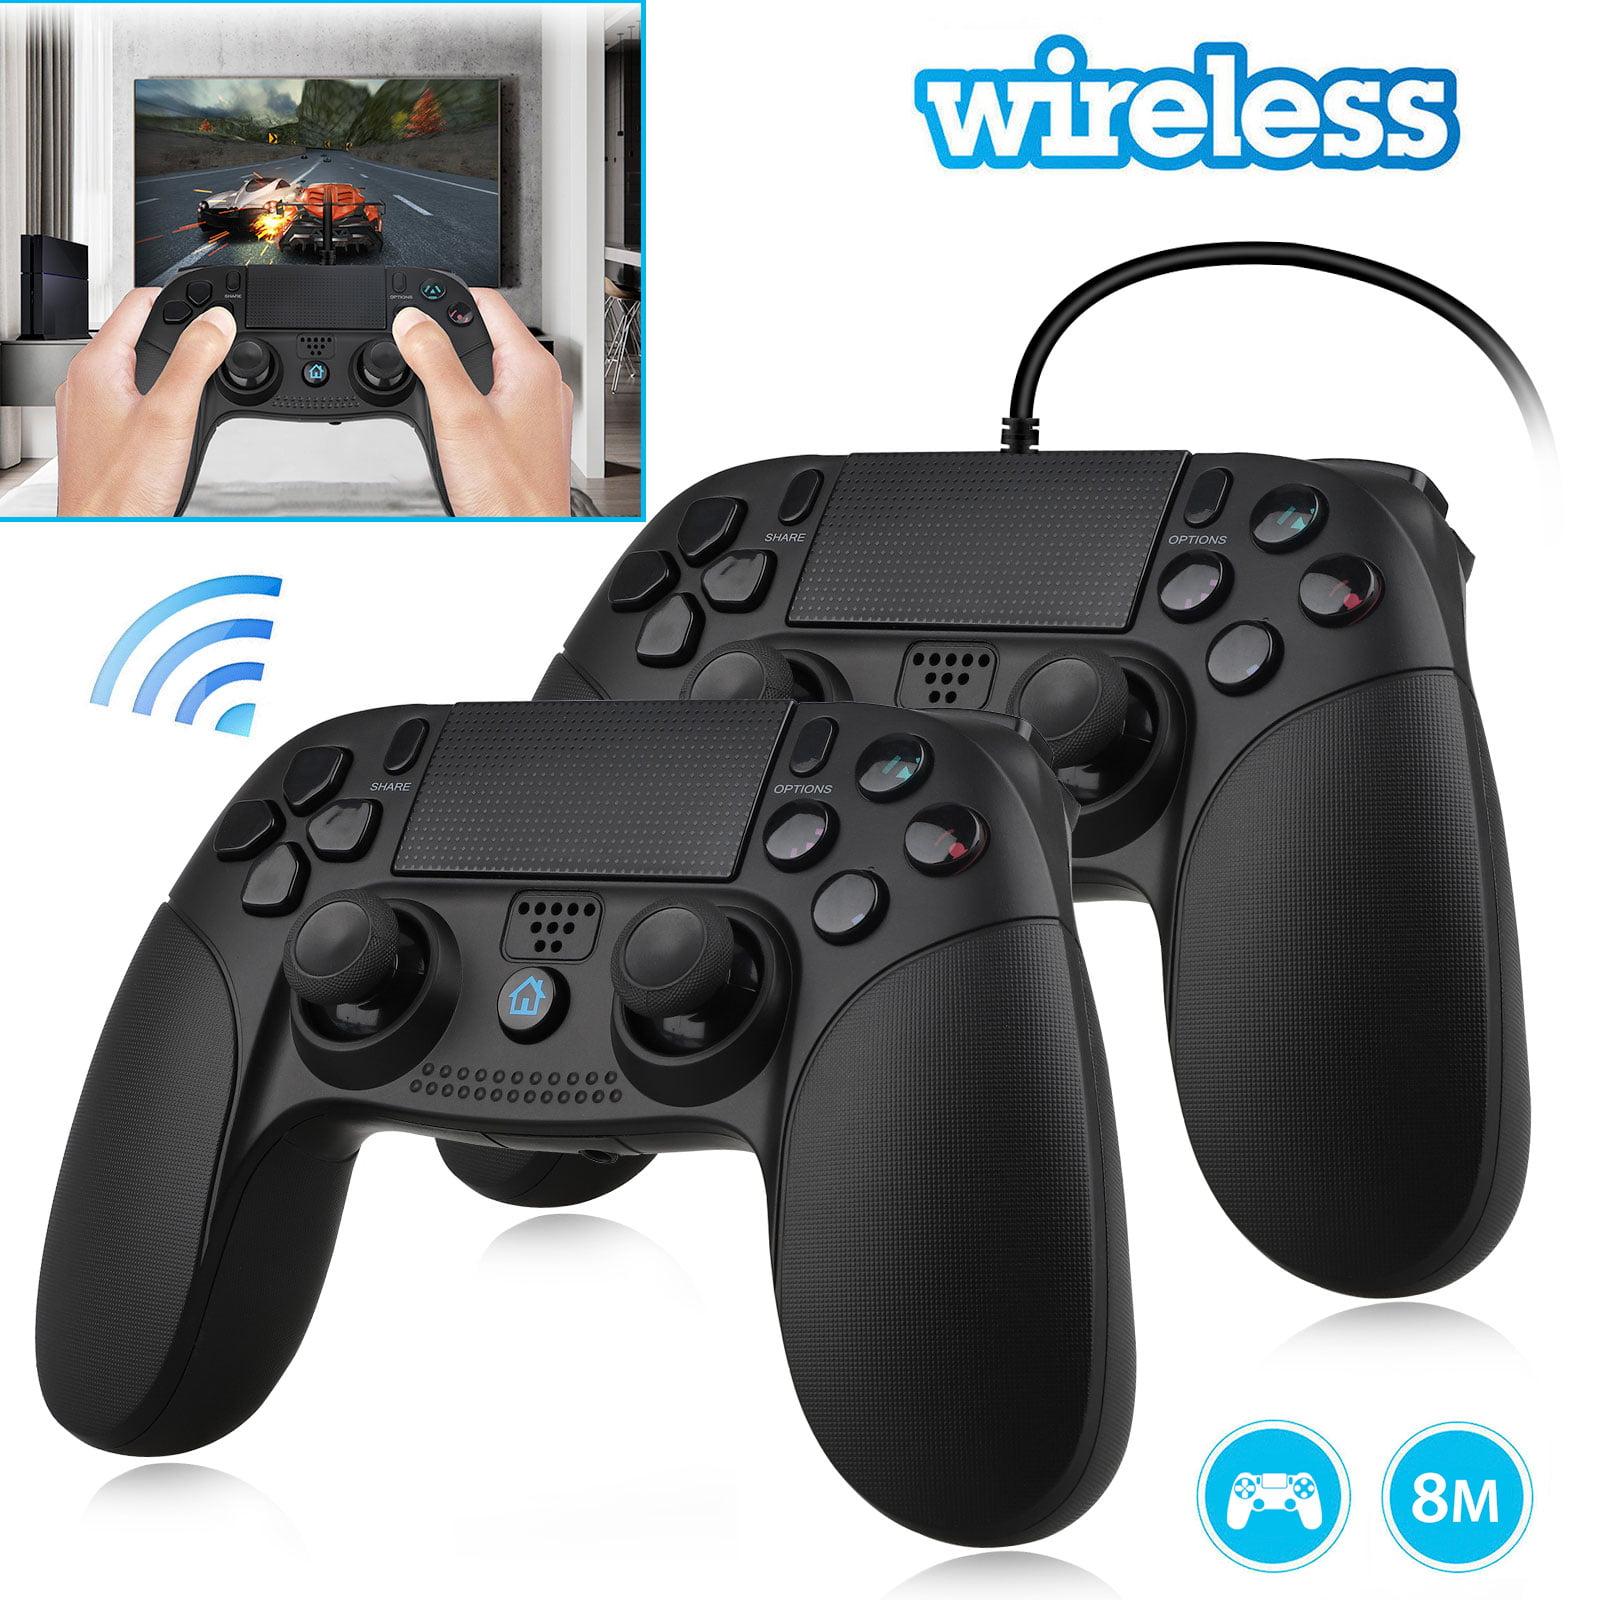 Ps4 Controller Wireless Wired Joysticks Eeekit Dual Shock 4 Game